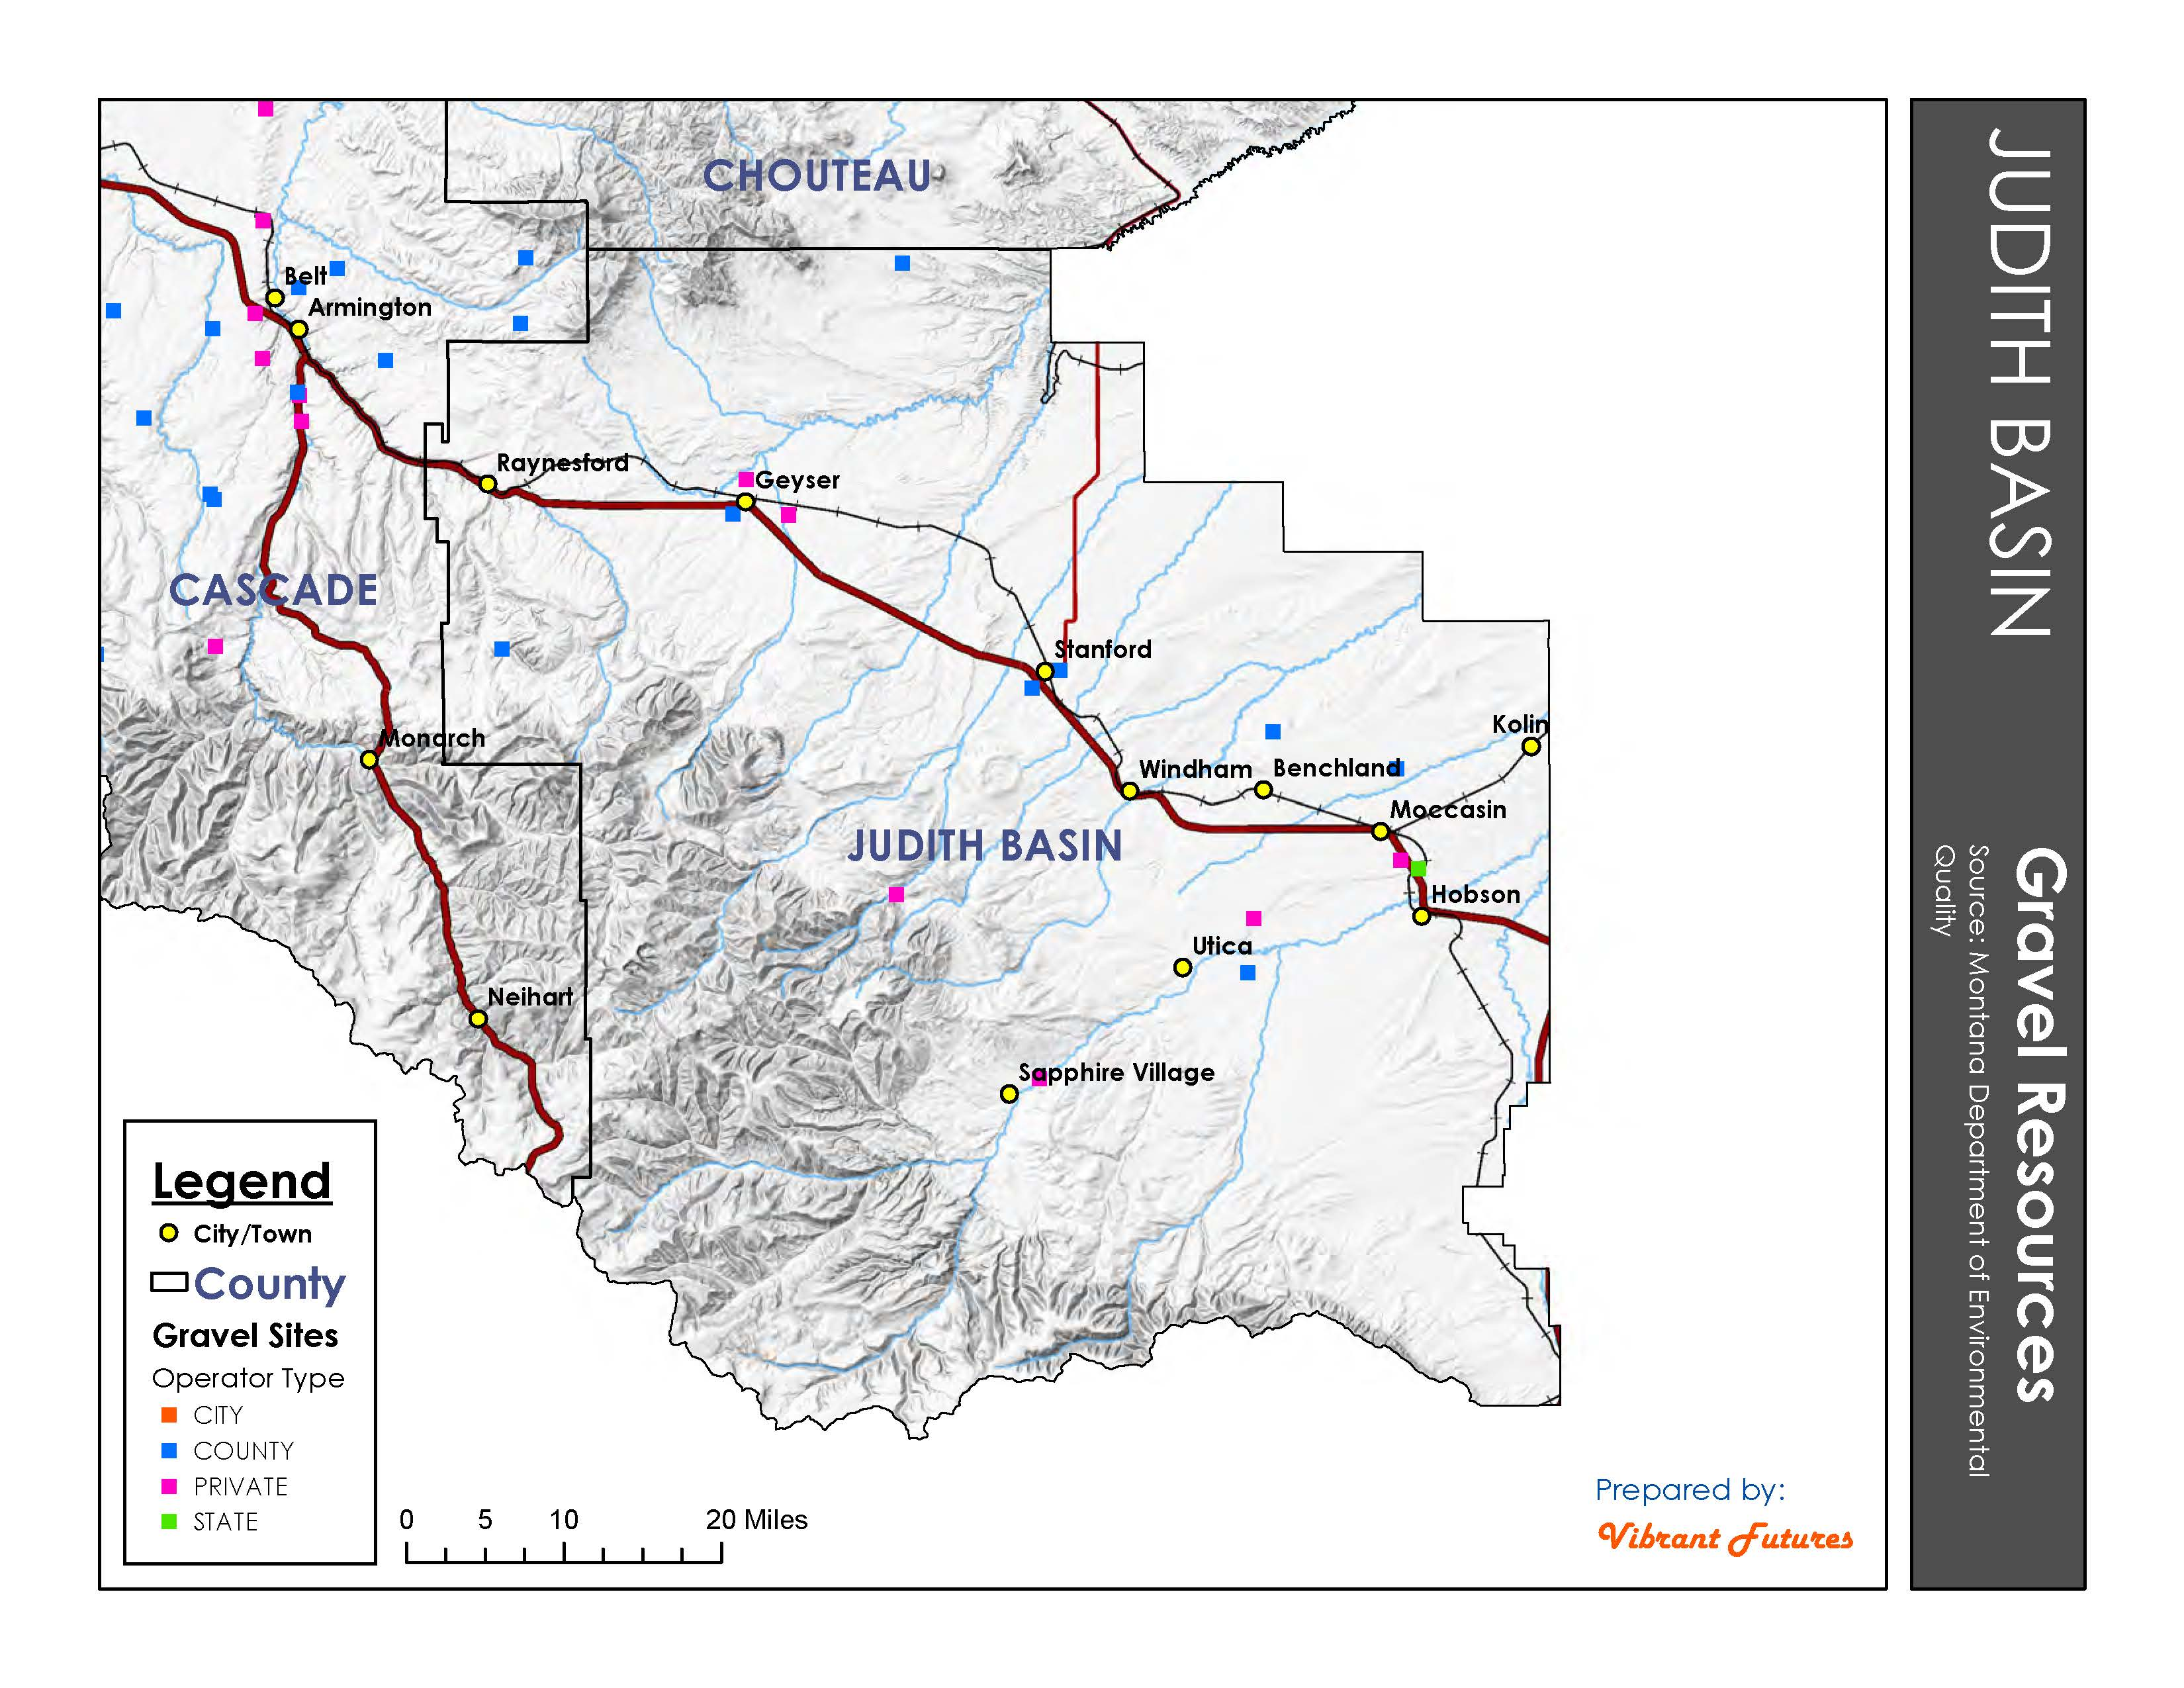 Gravel Resources Judith Basin County